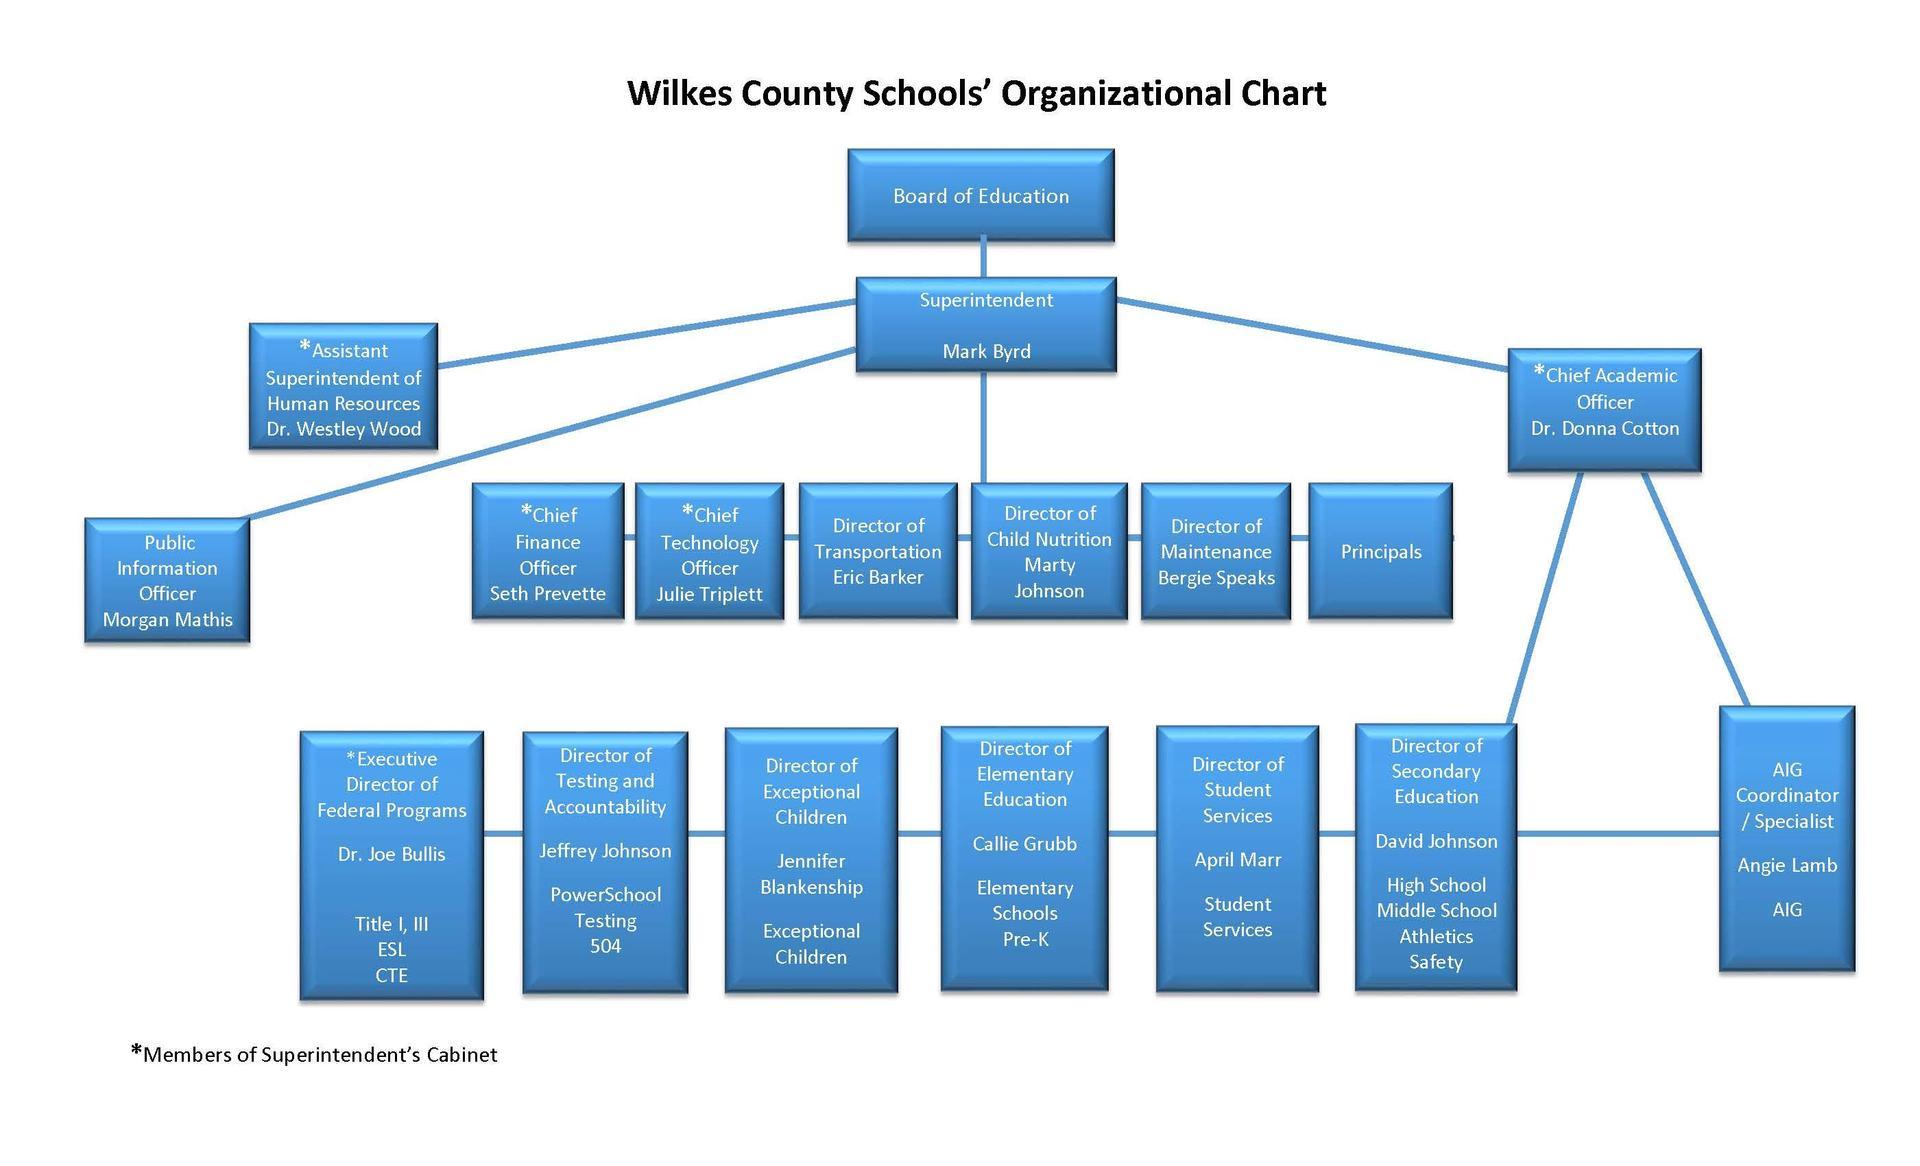 Wilkes County Schools Organizational Chart